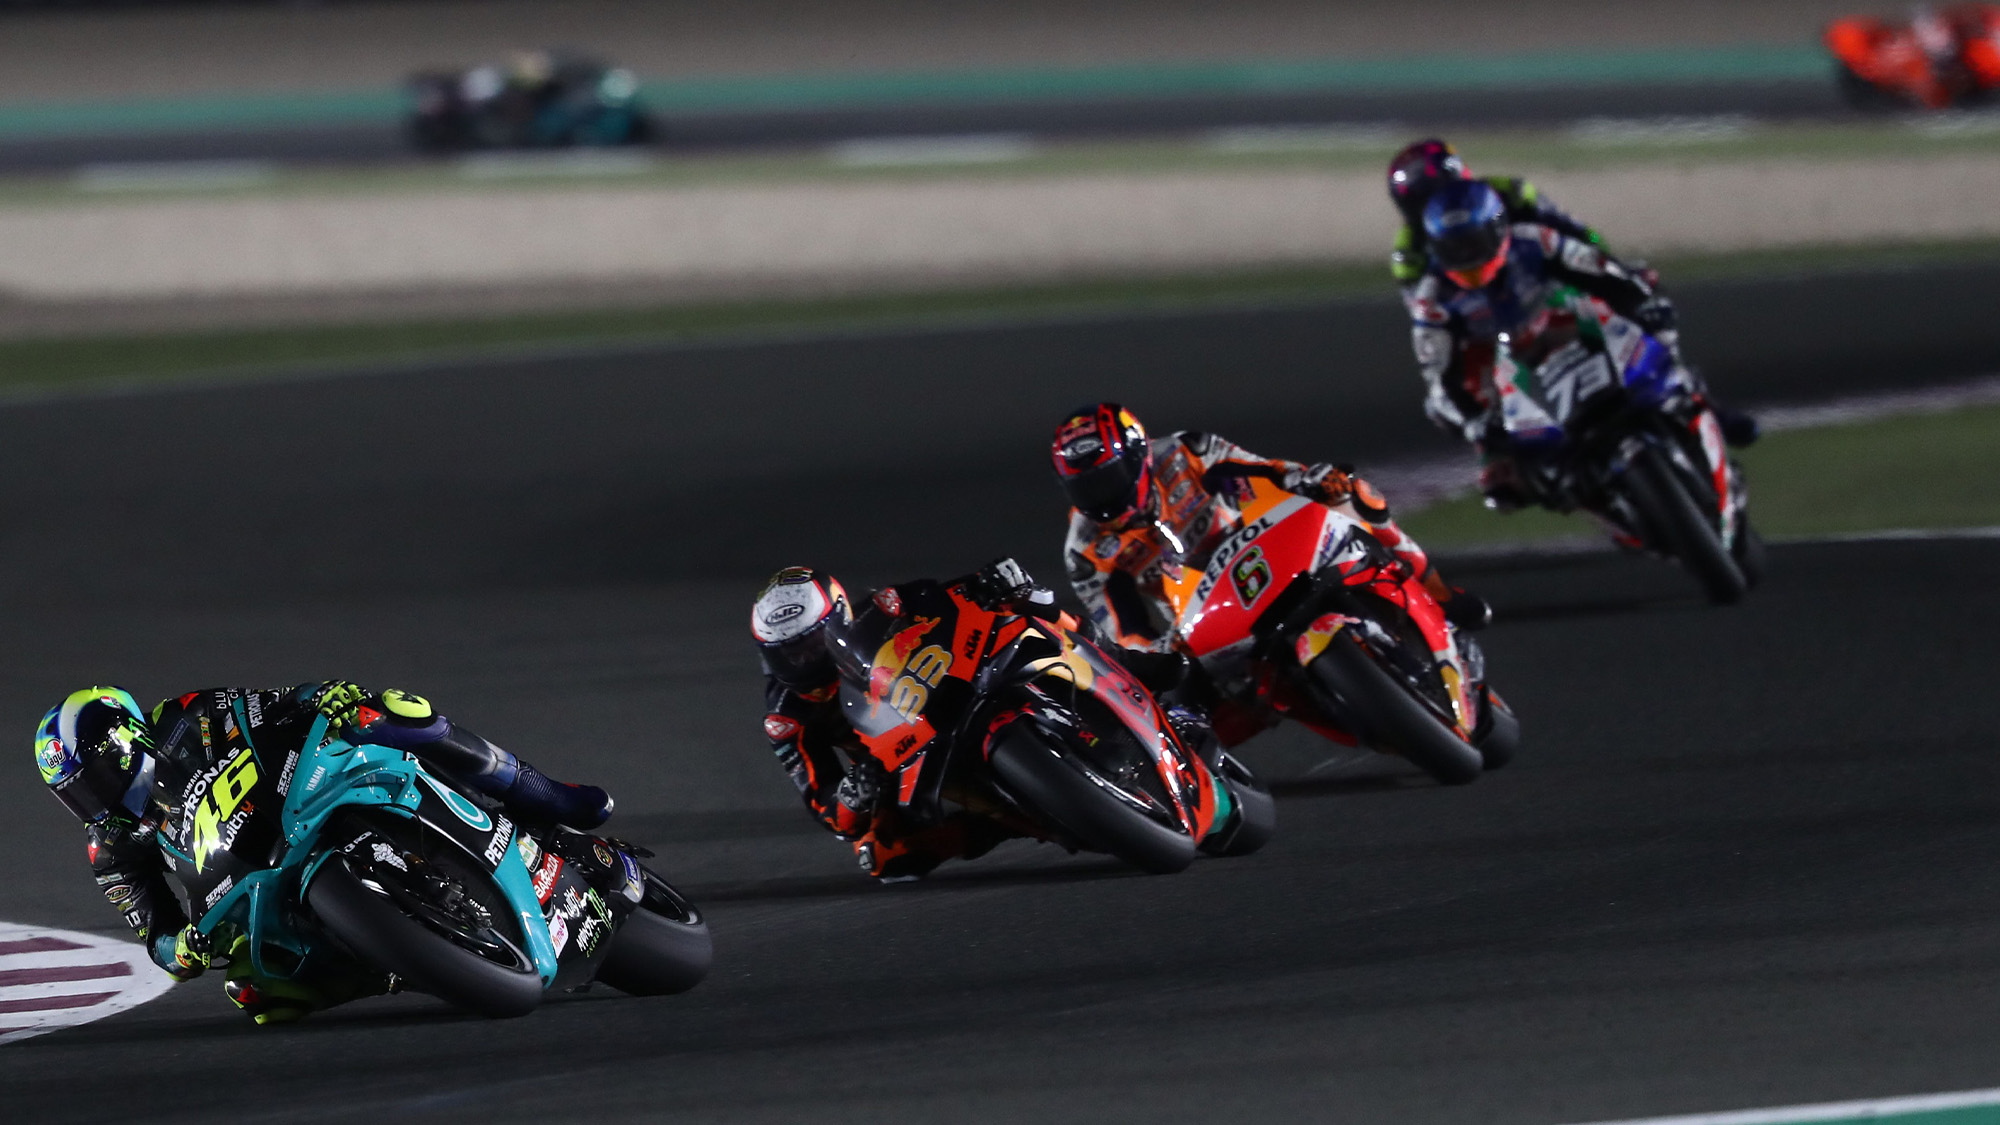 Valentino Rossi chased by Brad Binder Stefan Bradl and Alex MArquez in the 2021 MotoGP Qatar GP